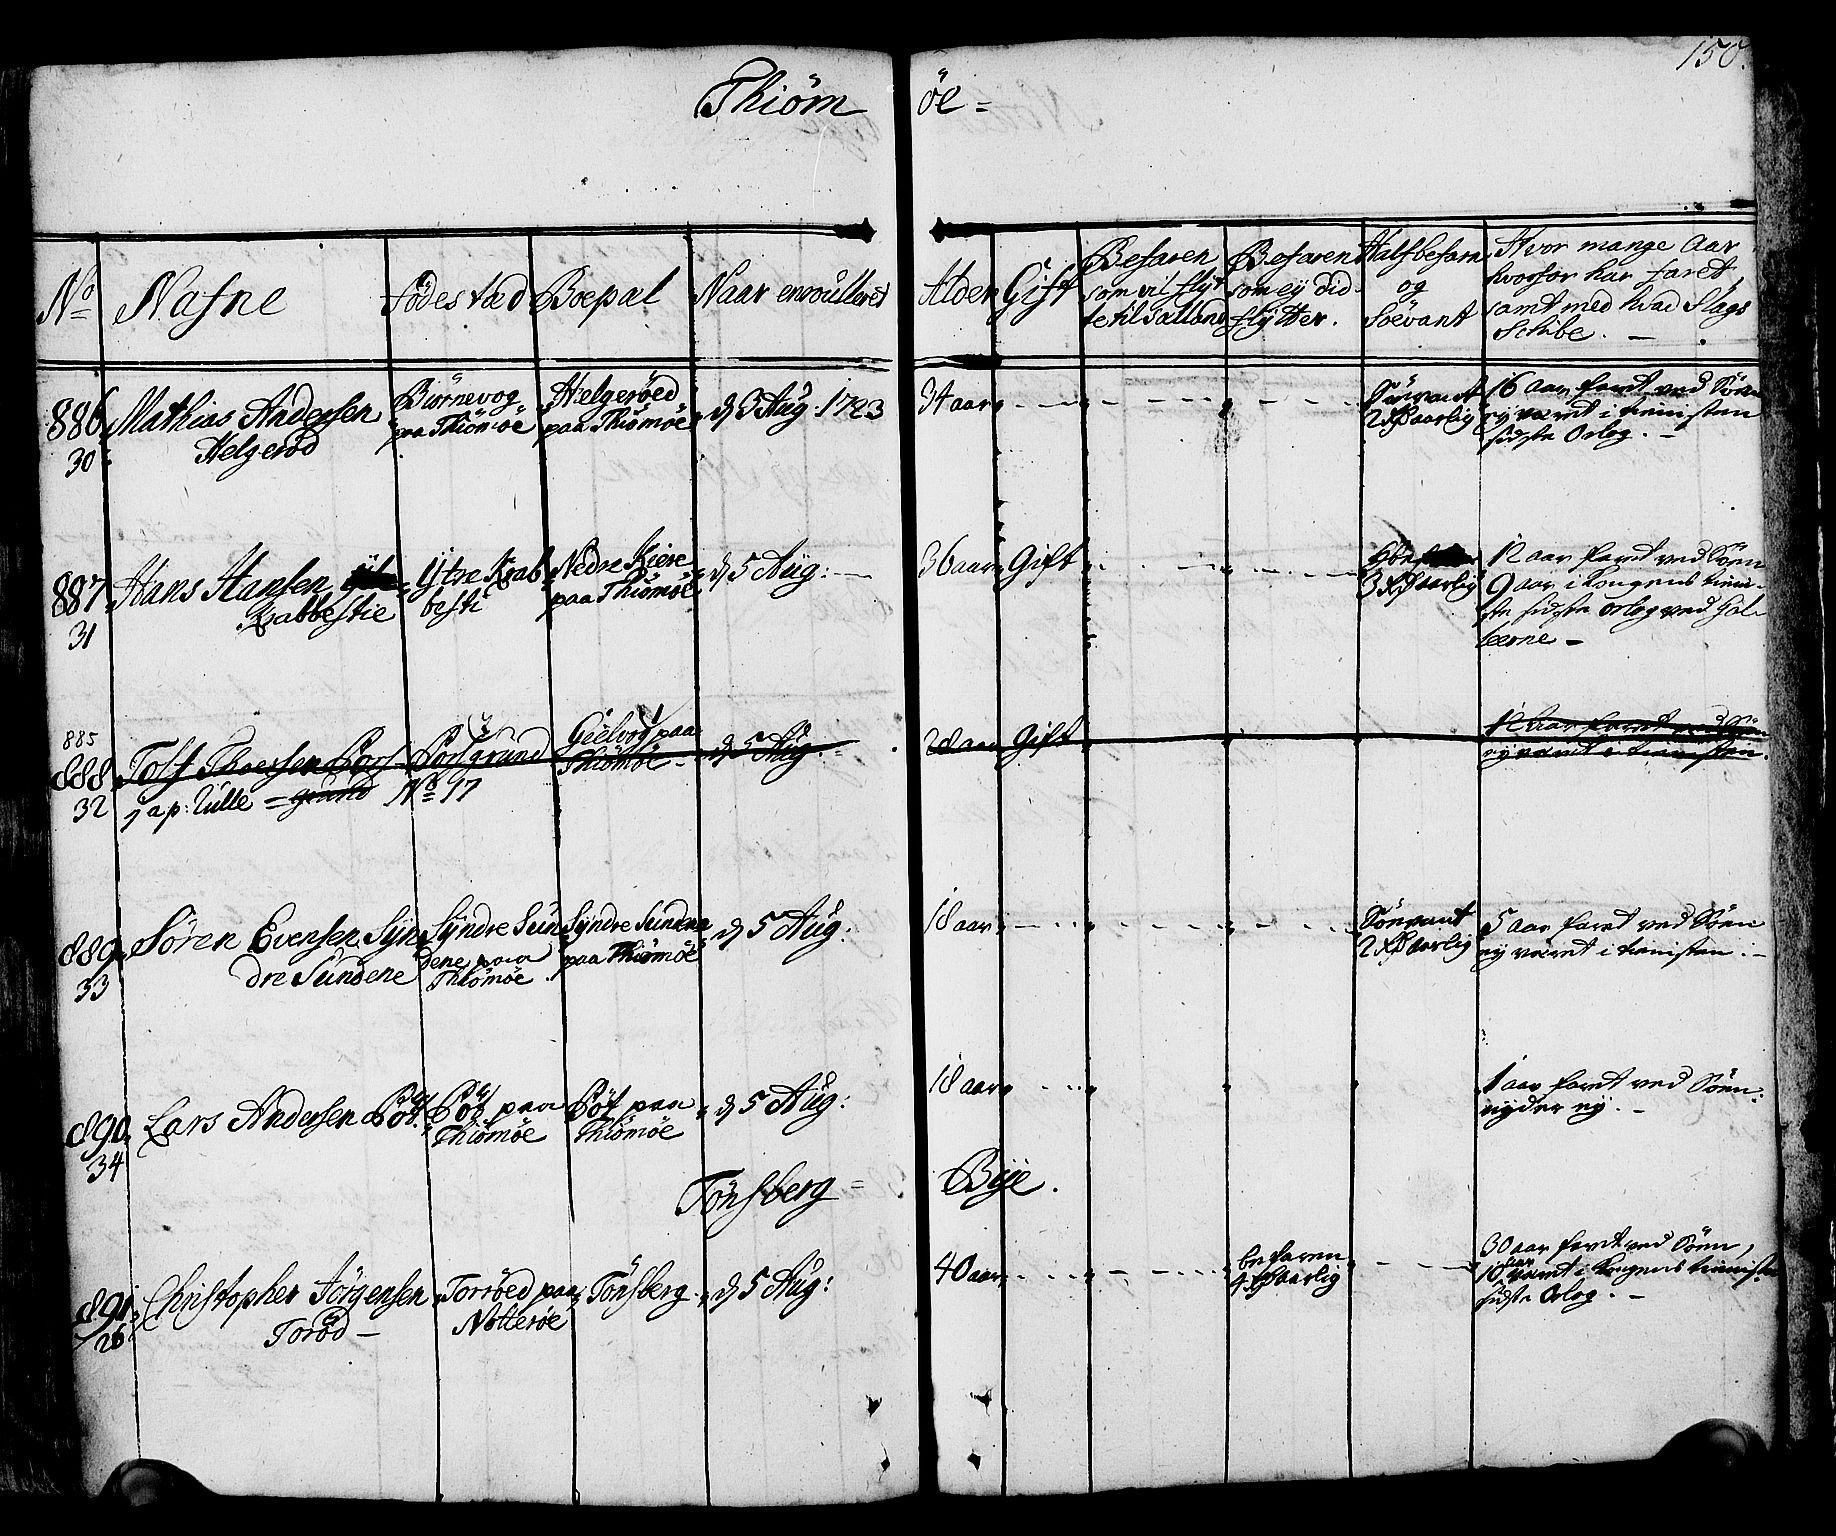 SAKO, Drammen innrulleringsdistrikt, F/Fa/L0002: Hovedrulle, 1723-1726, p. 151